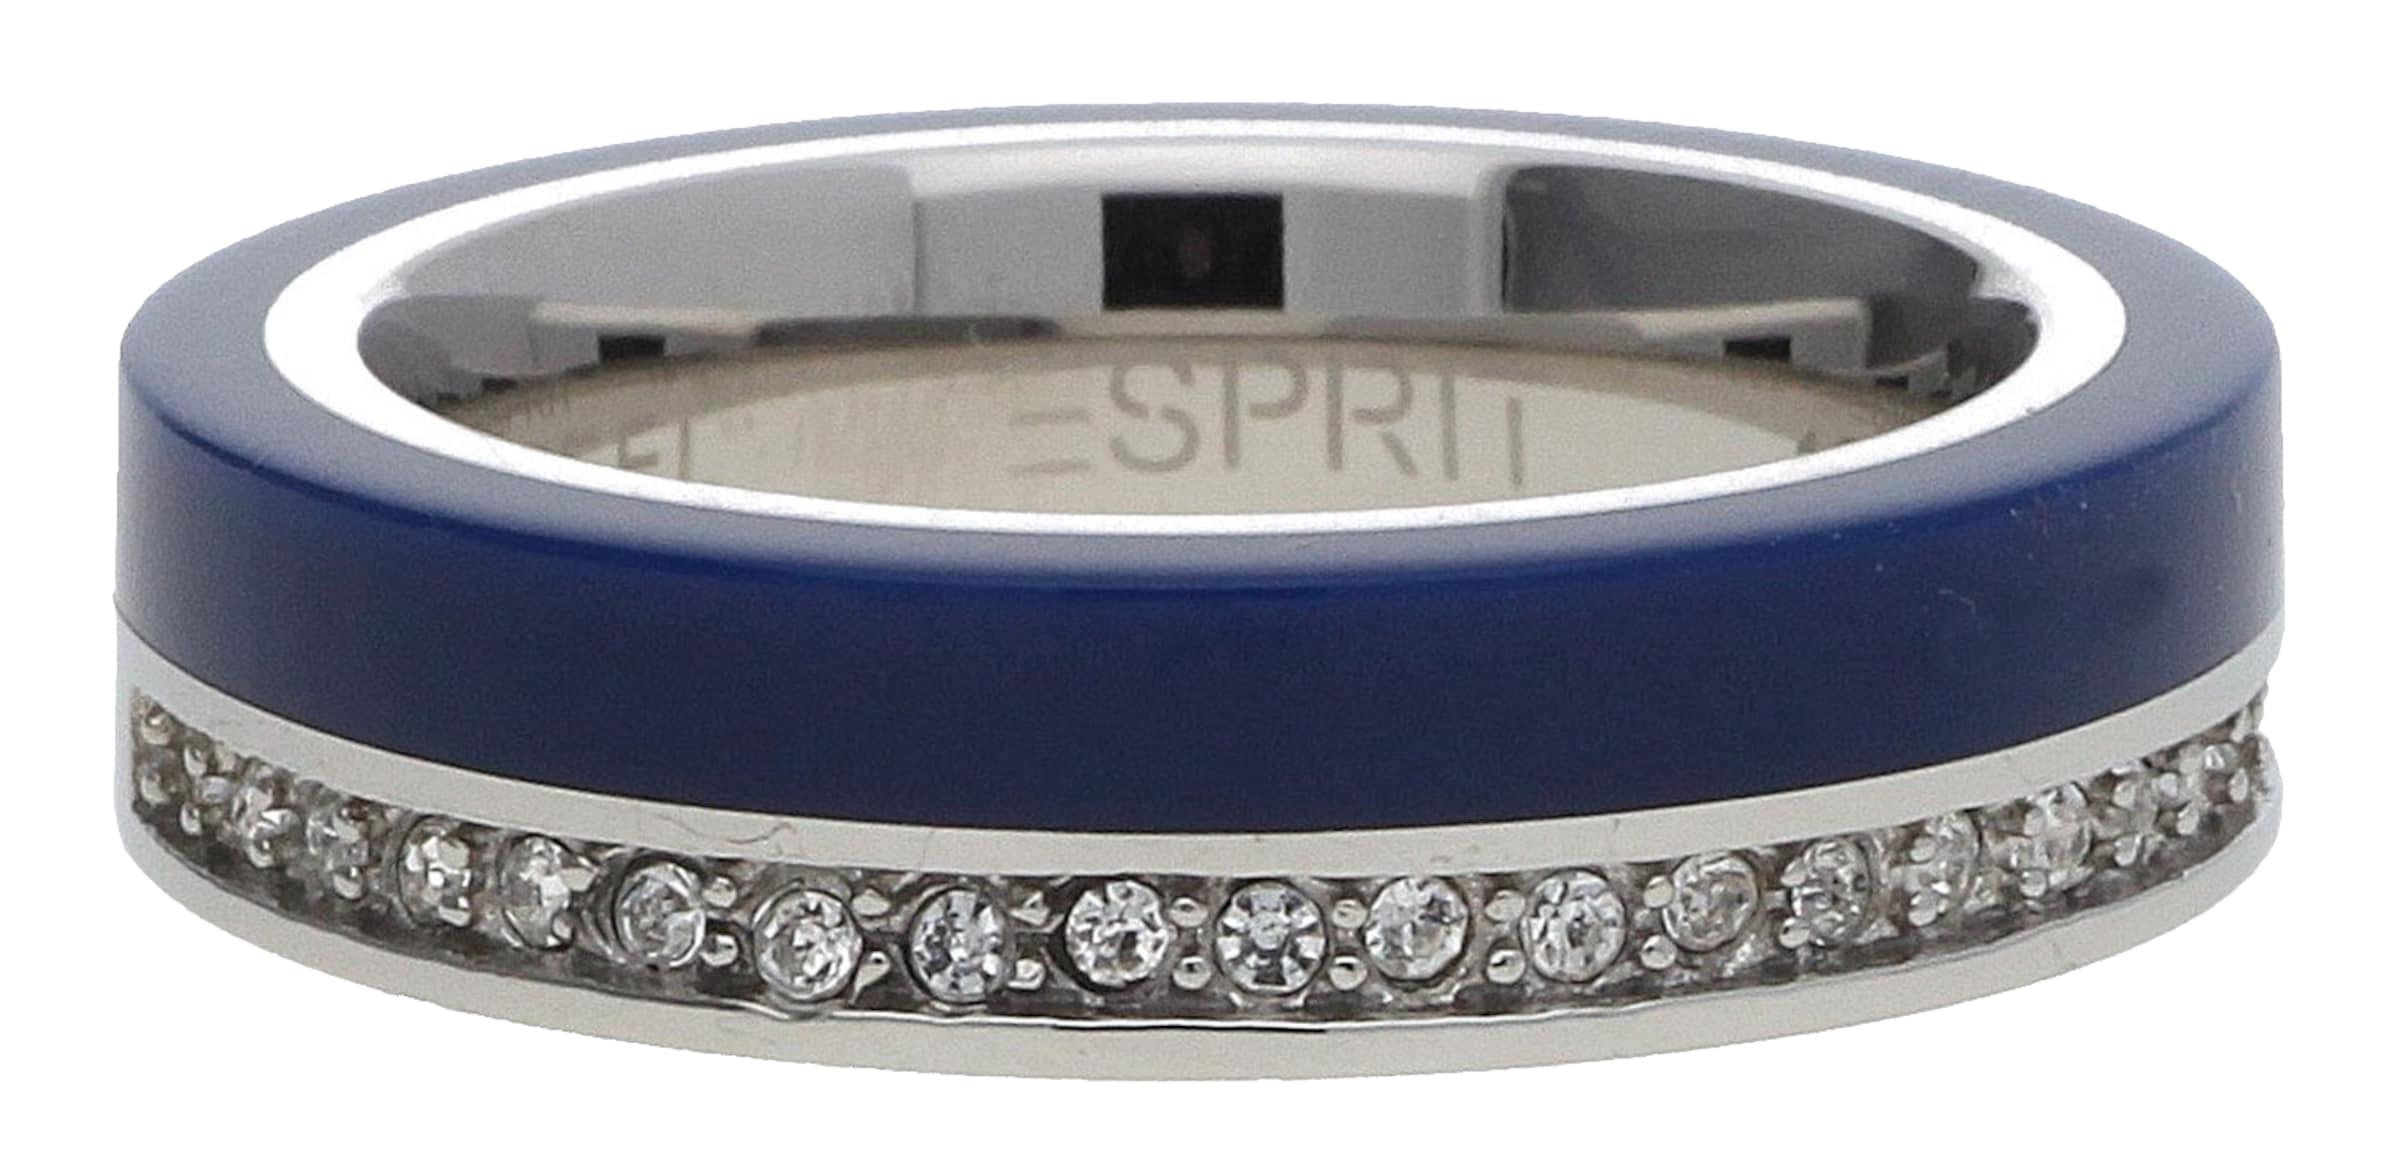 blau Esprit Marin Silber Esrg11565c 68 Fingerring In BlauSilber rdCsQth